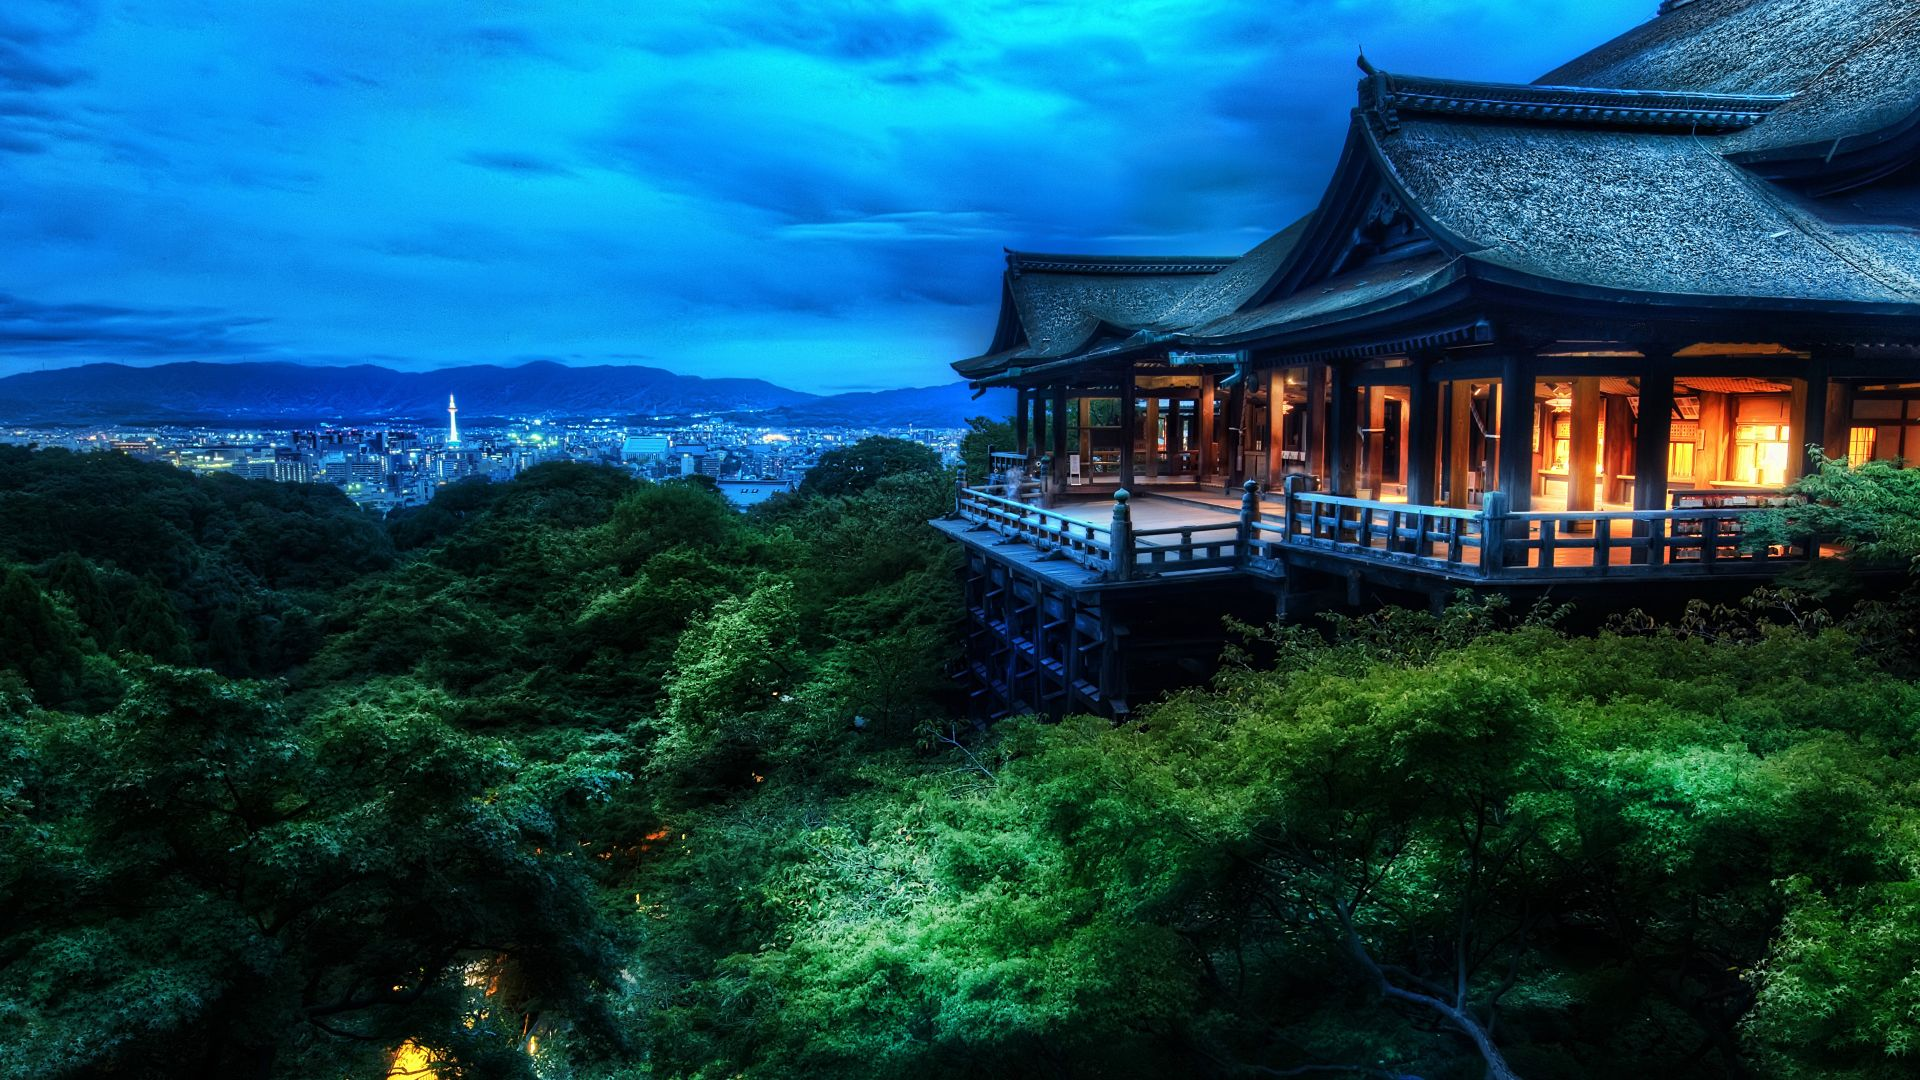 Kiyomizu Dera Kyoto Building HD Wallpaper 187 FullHDWpp 1920x1080